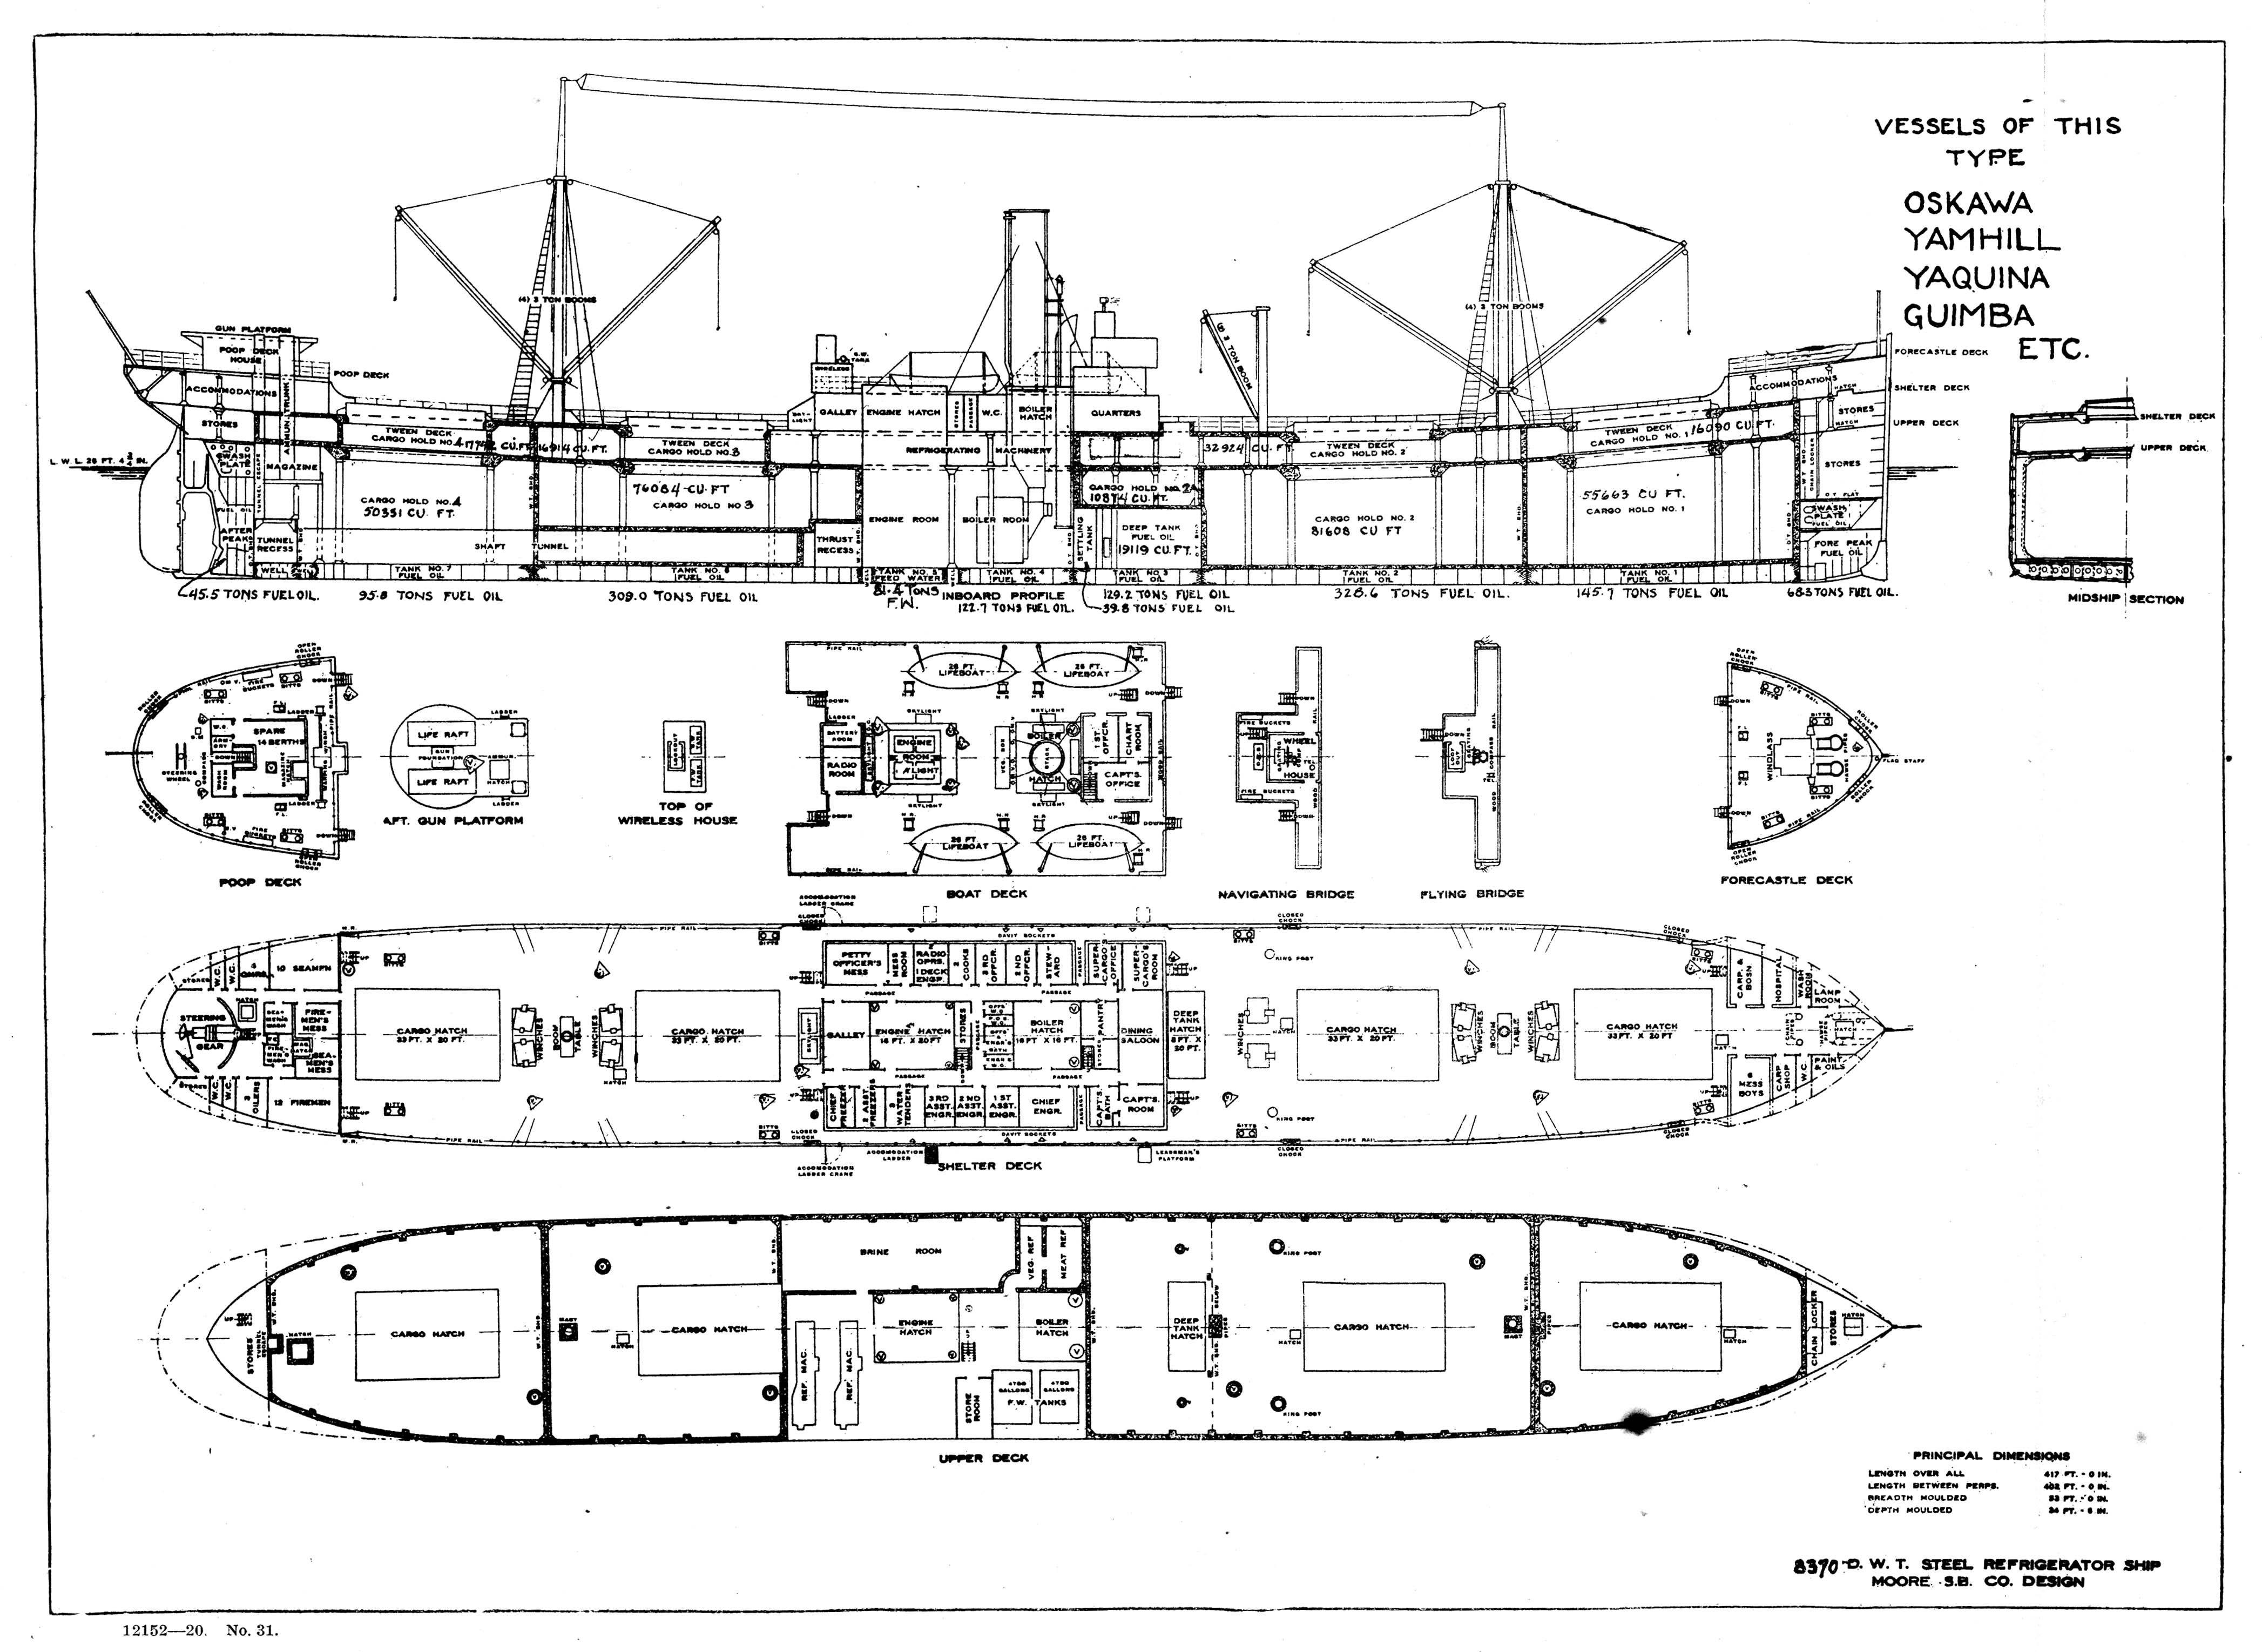 Ussb Ship Register August 1 Plan 31